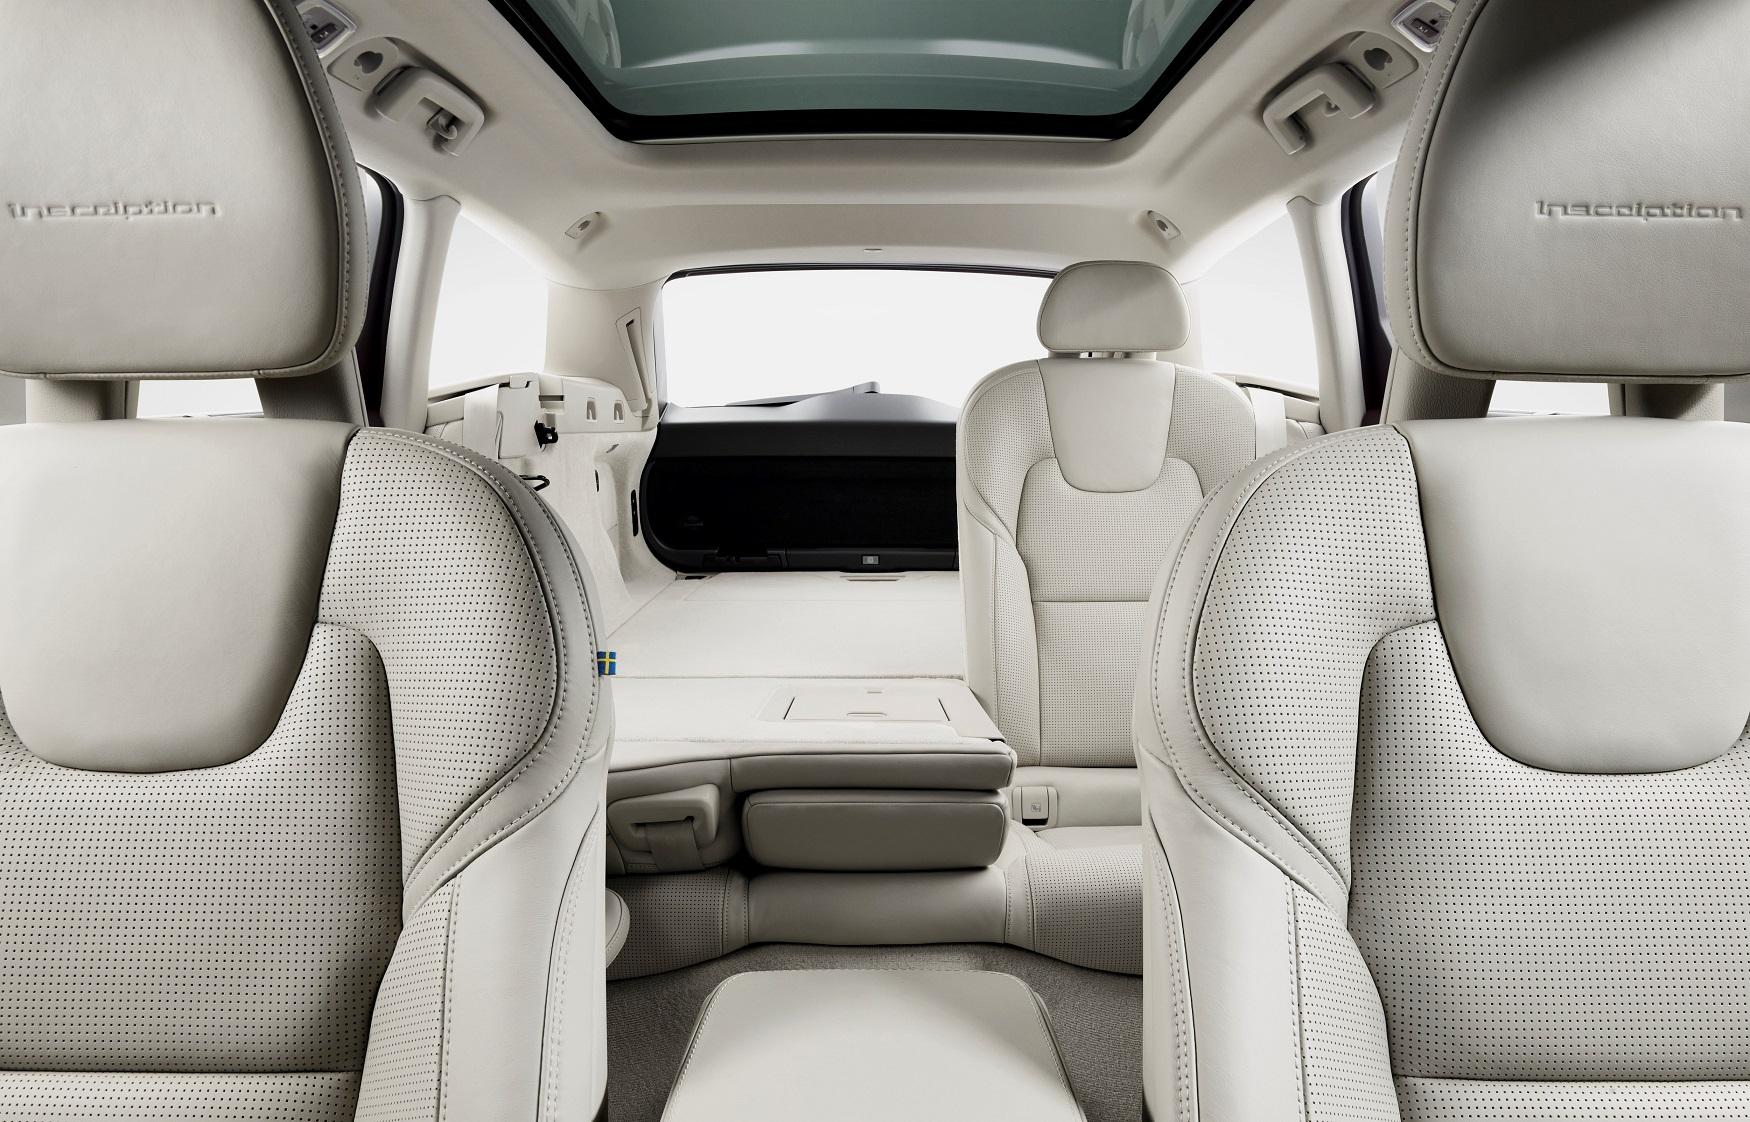 tisha 173842 volvo v90 studio folding rear seats